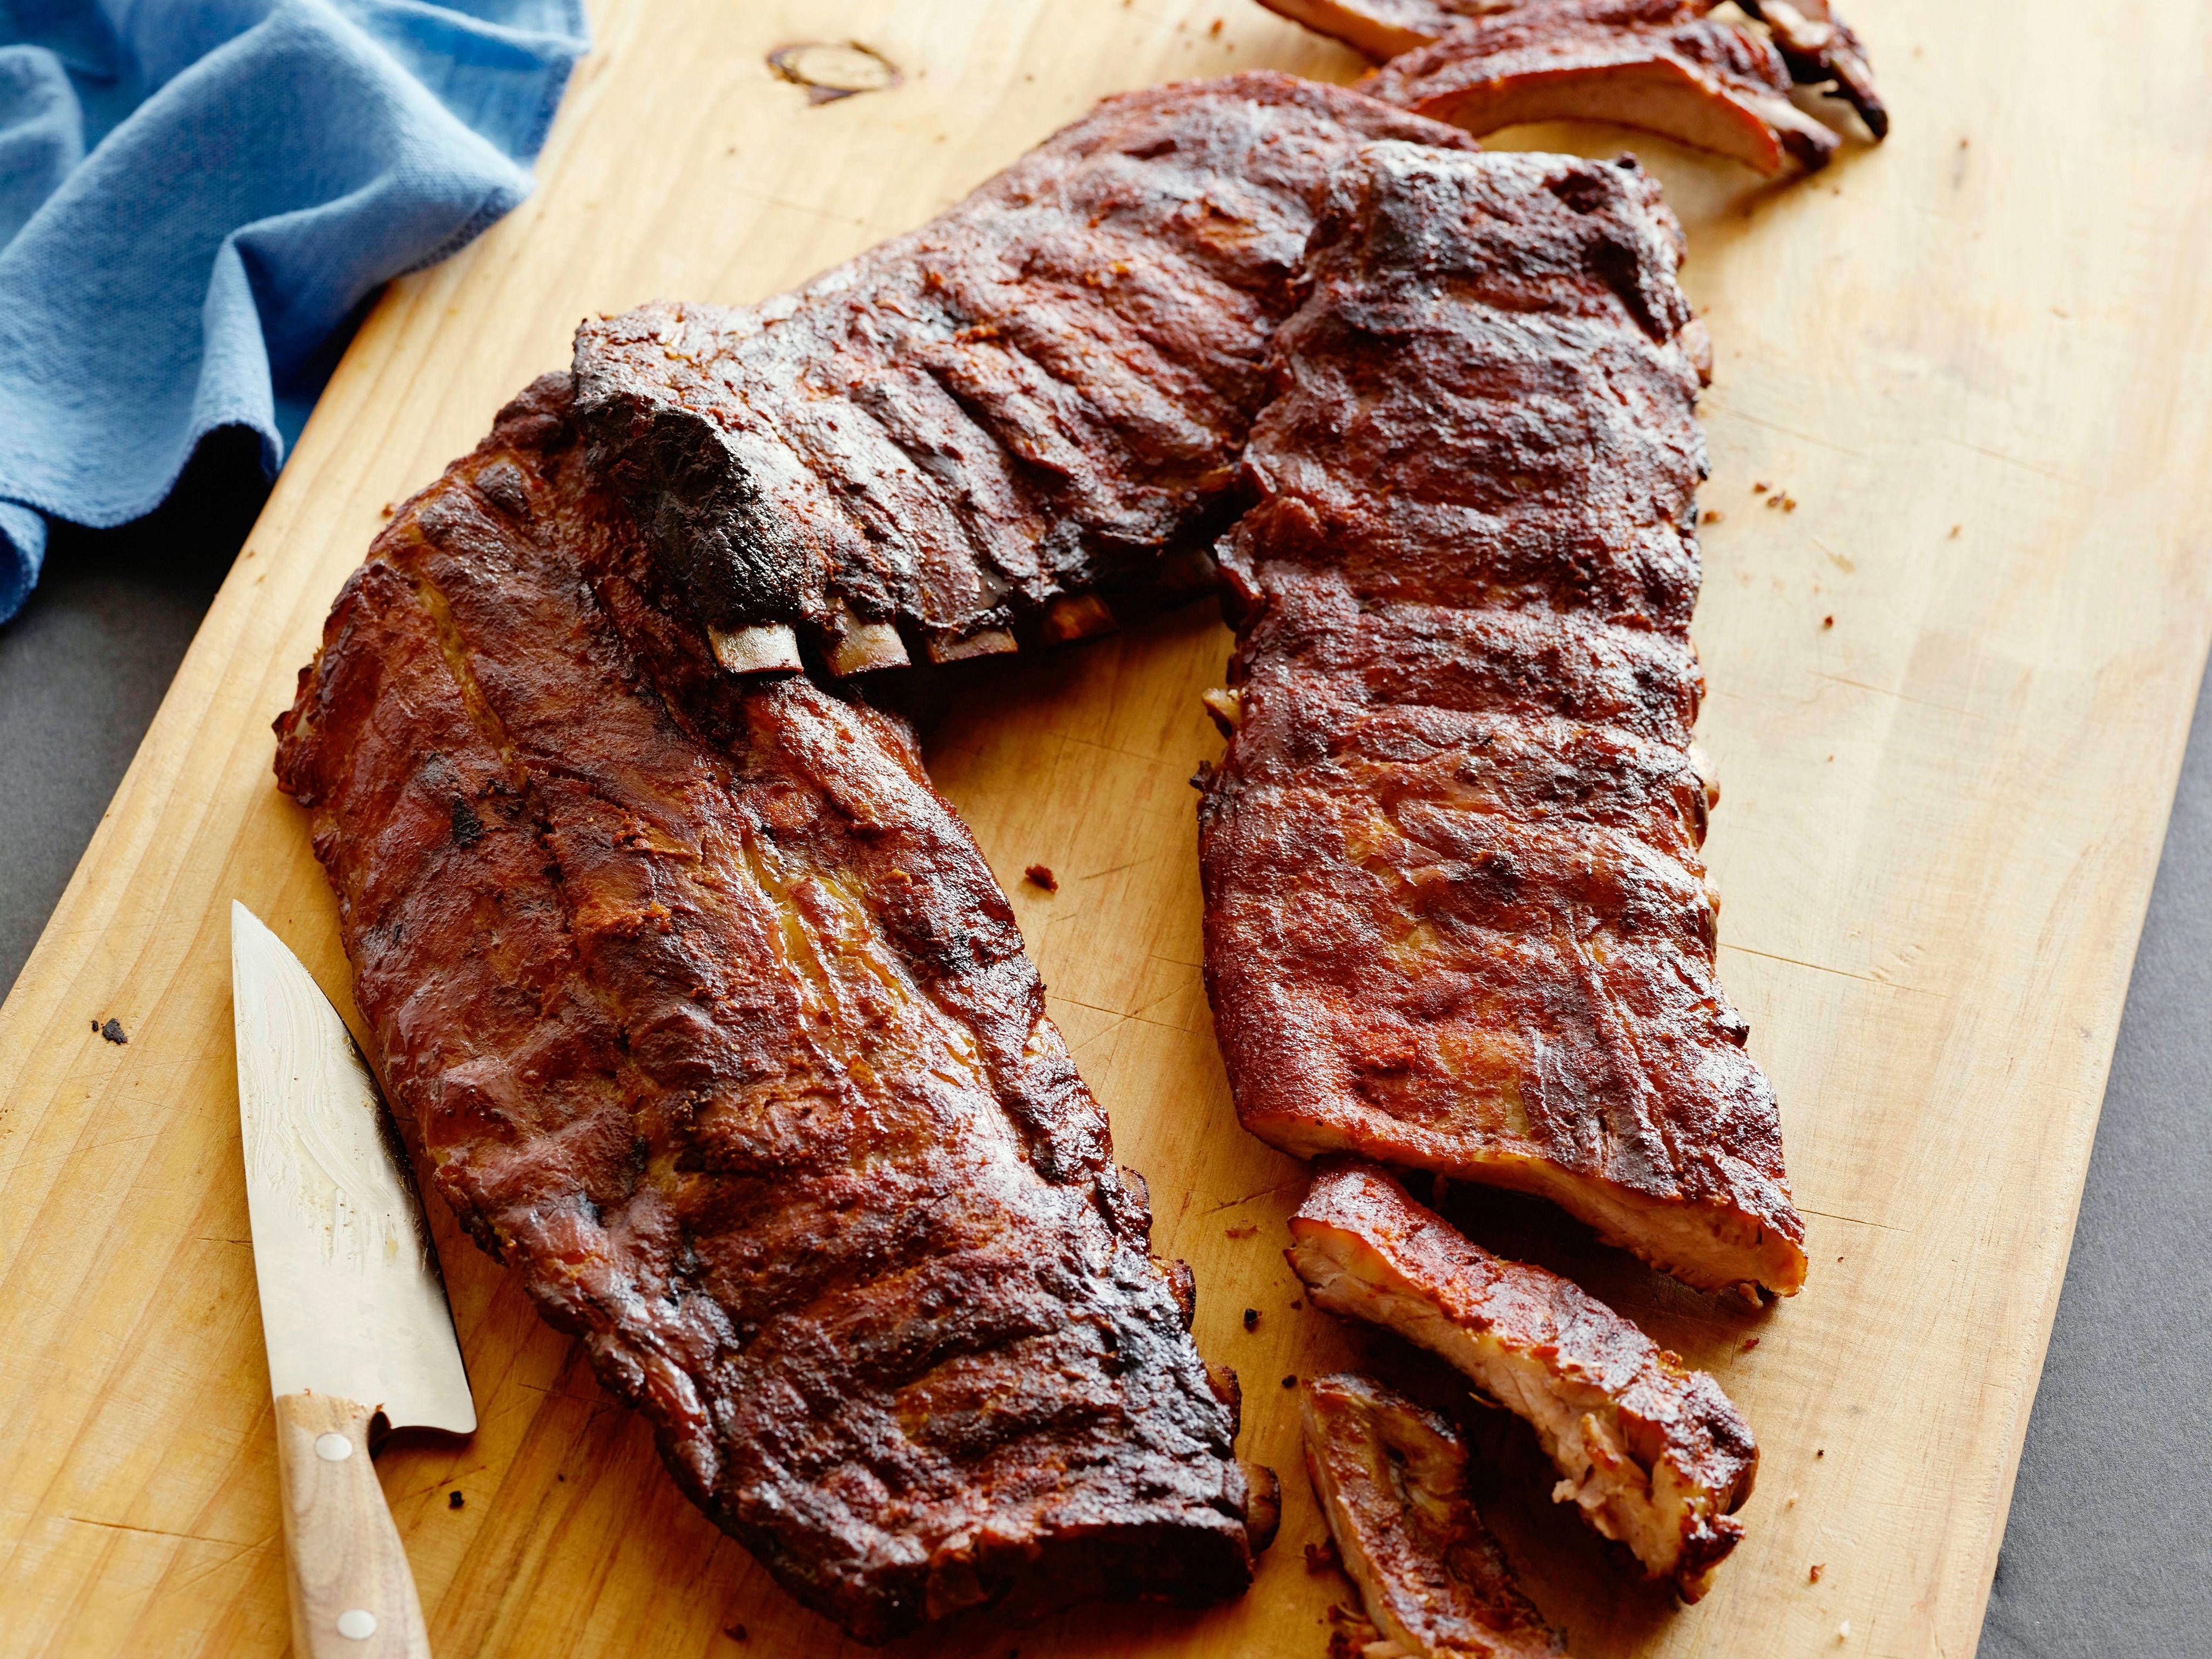 Barbecue st louis pork ribs recipe pork rib recipes pork barbecue st louis pork ribs forumfinder Image collections